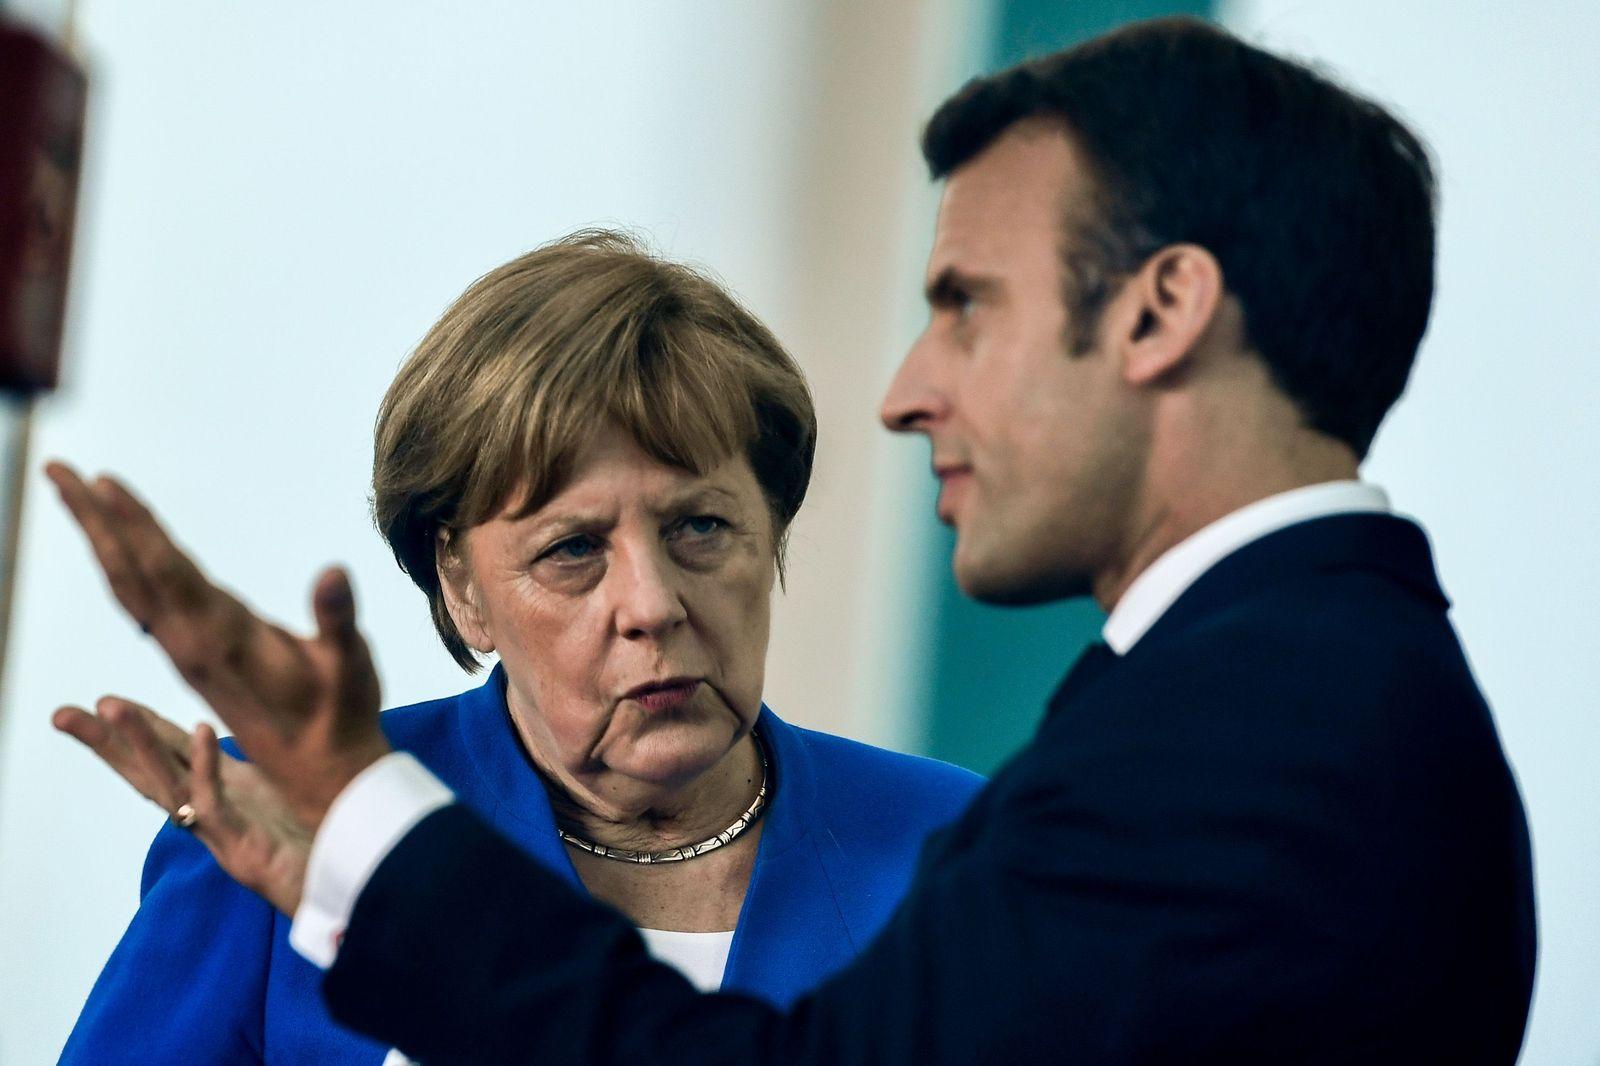 Angela Merkel / Emmanuel Macron